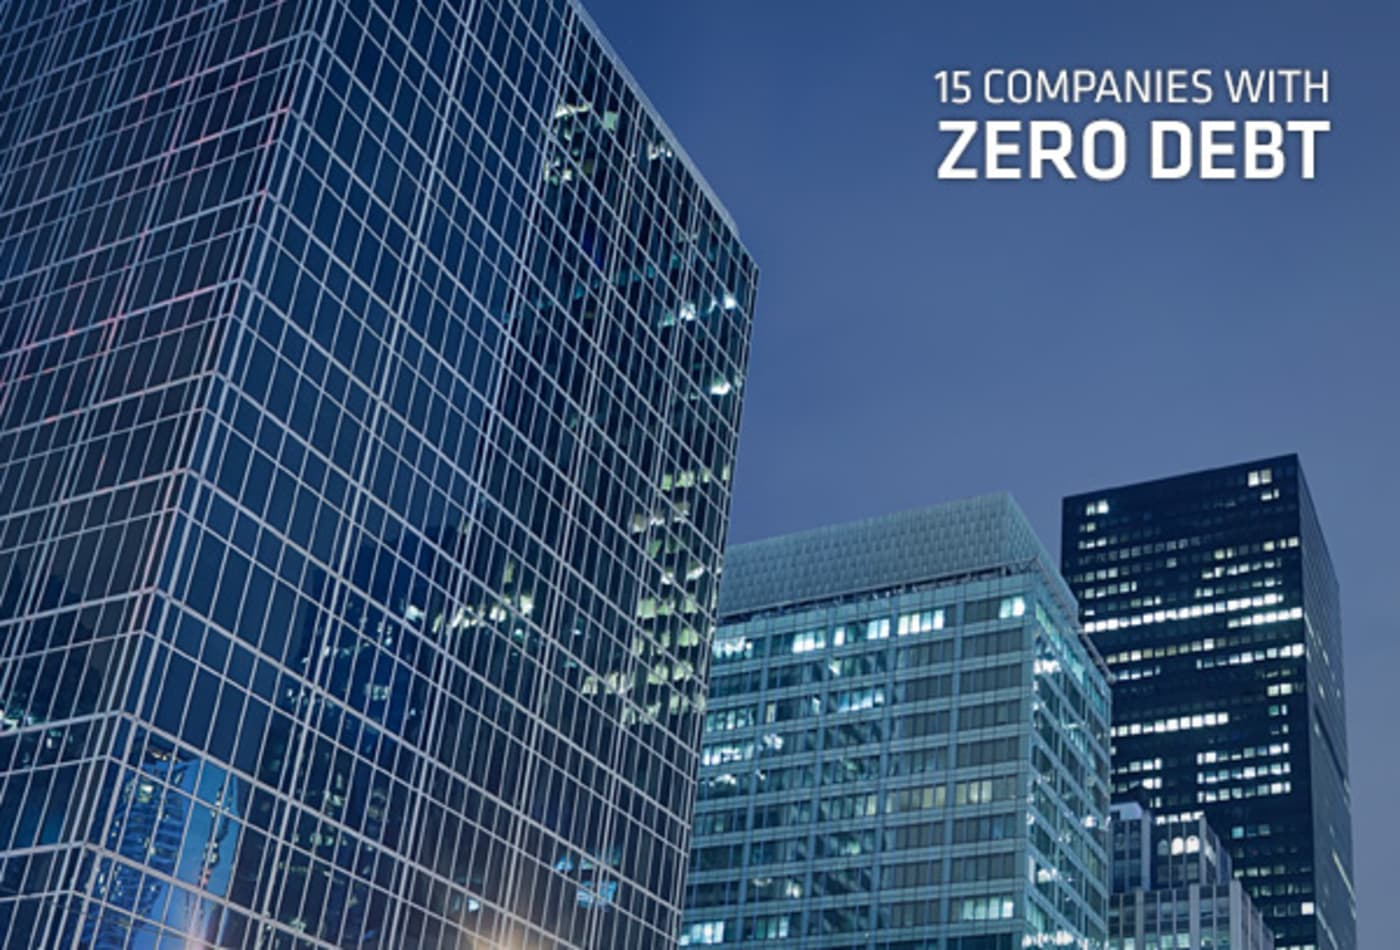 Companies-with-zero-debt-2012-cover.jpg